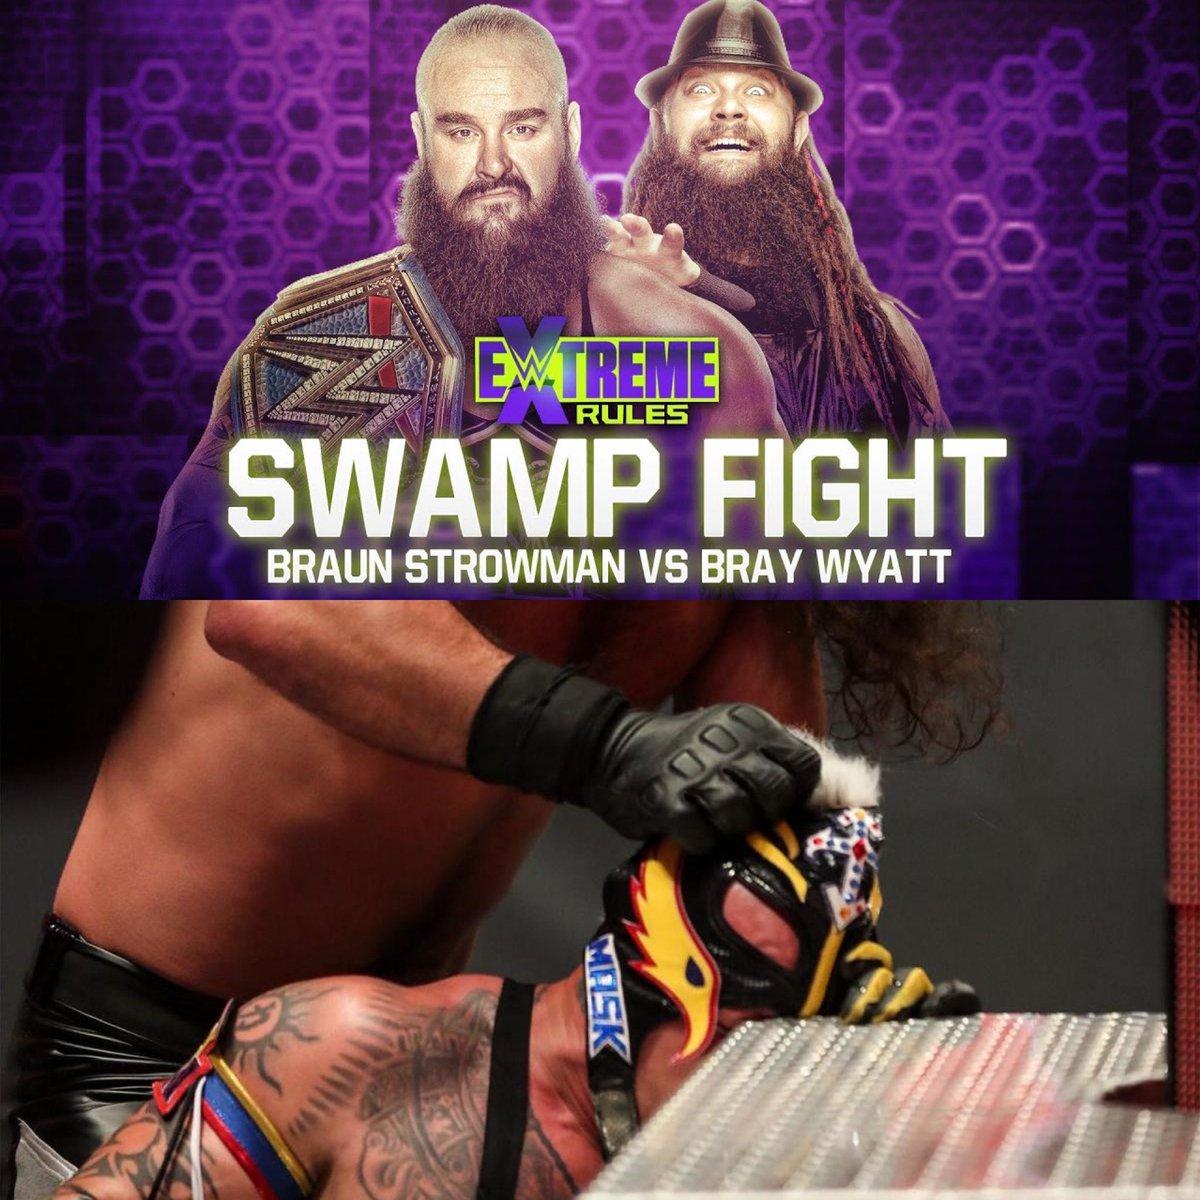 El domingo 19 de Julio WWE emitirá dos combates cinemáticos en Extreme Rules   #WWExFOX #WWE #ExtremeRules #Deportes @WWEonFOX #FoxAction https://t.co/kisr3VgCEo